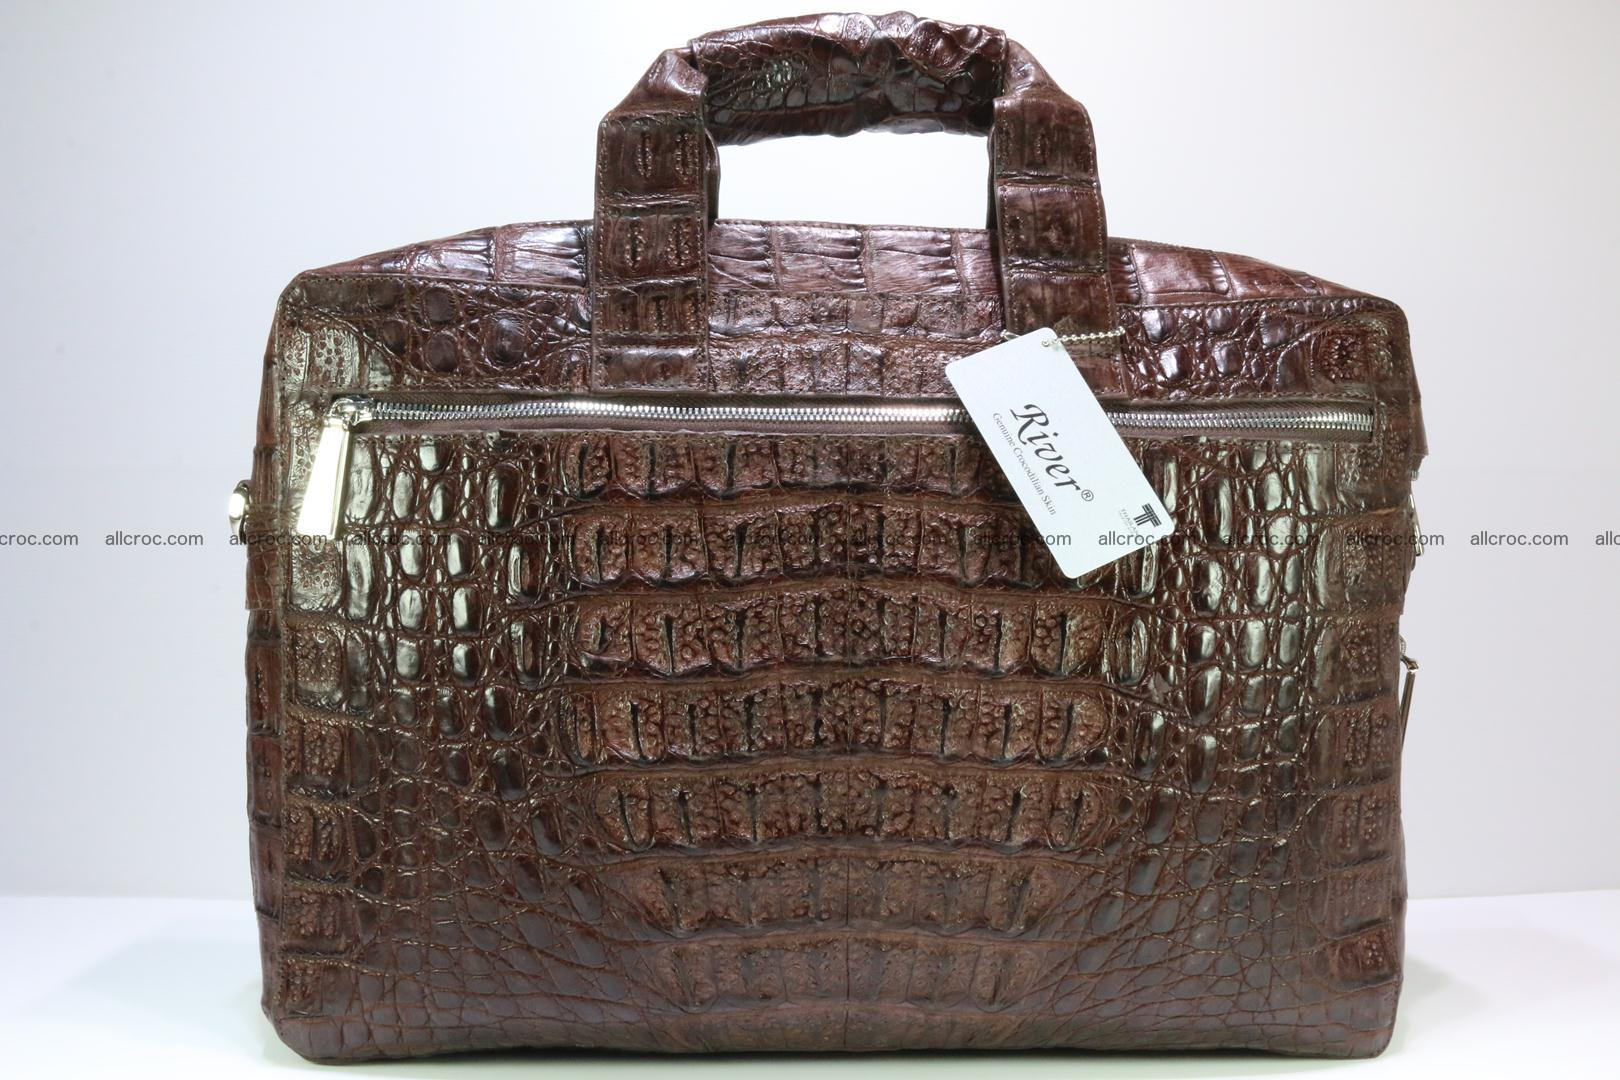 Crocodile skin handbag 126 Foto 1